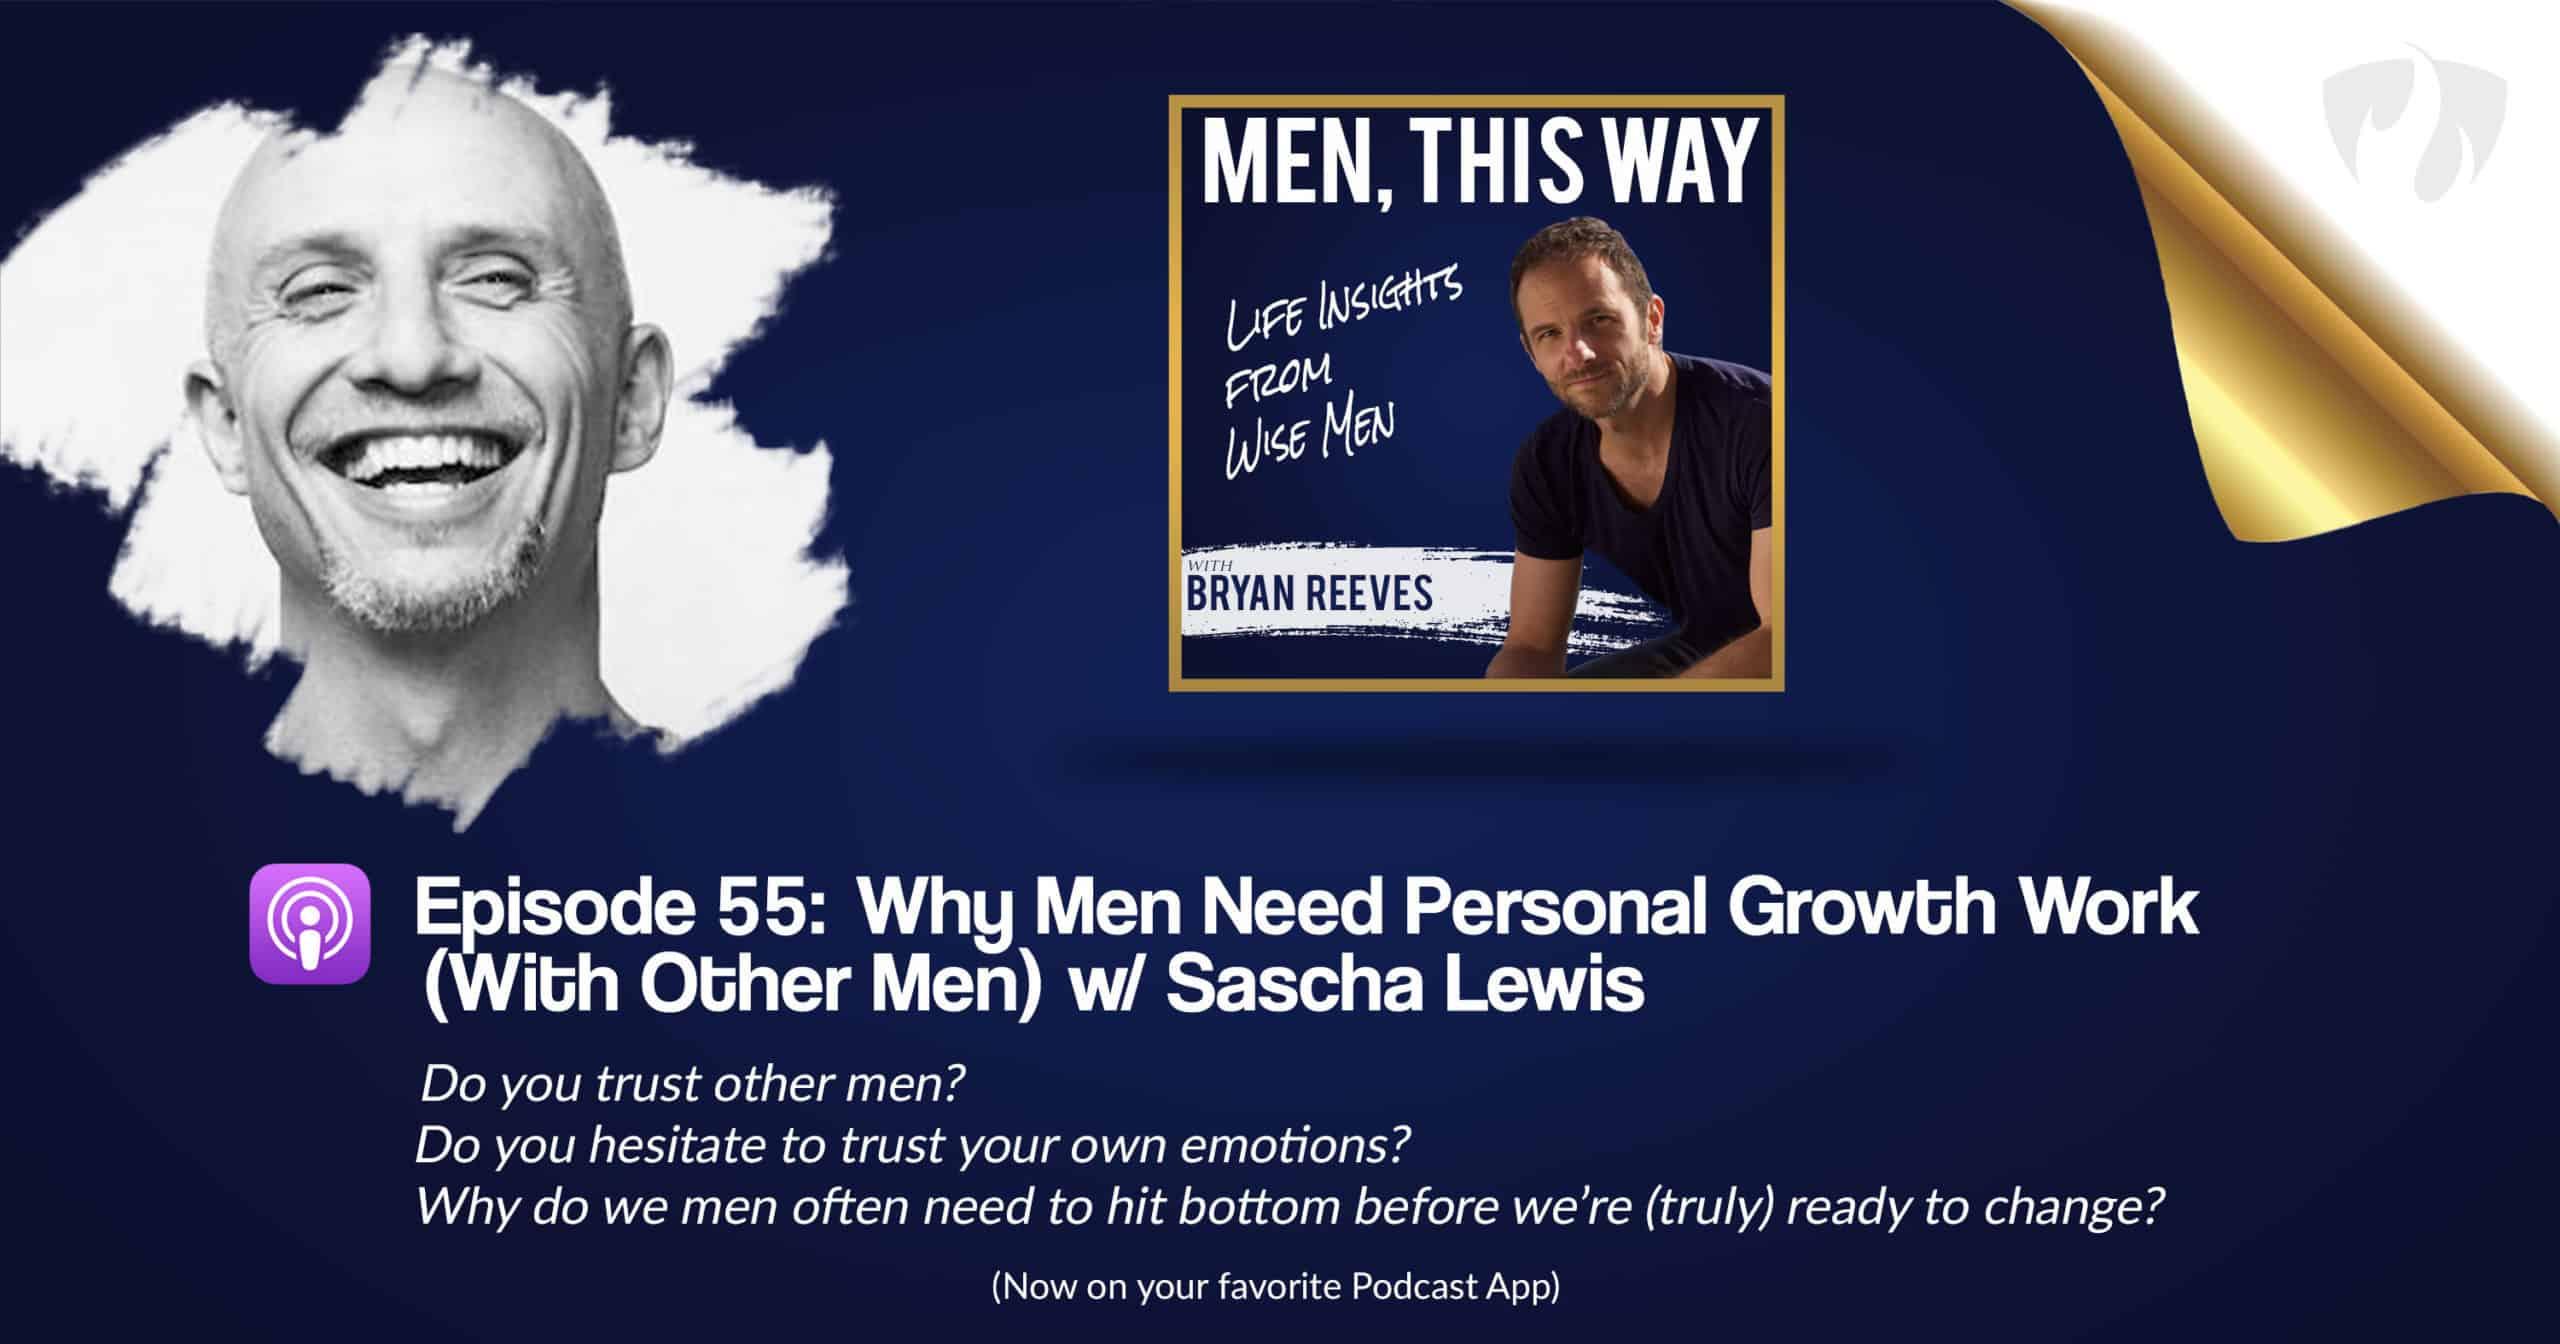 MTW GUEST Sascha Lewis